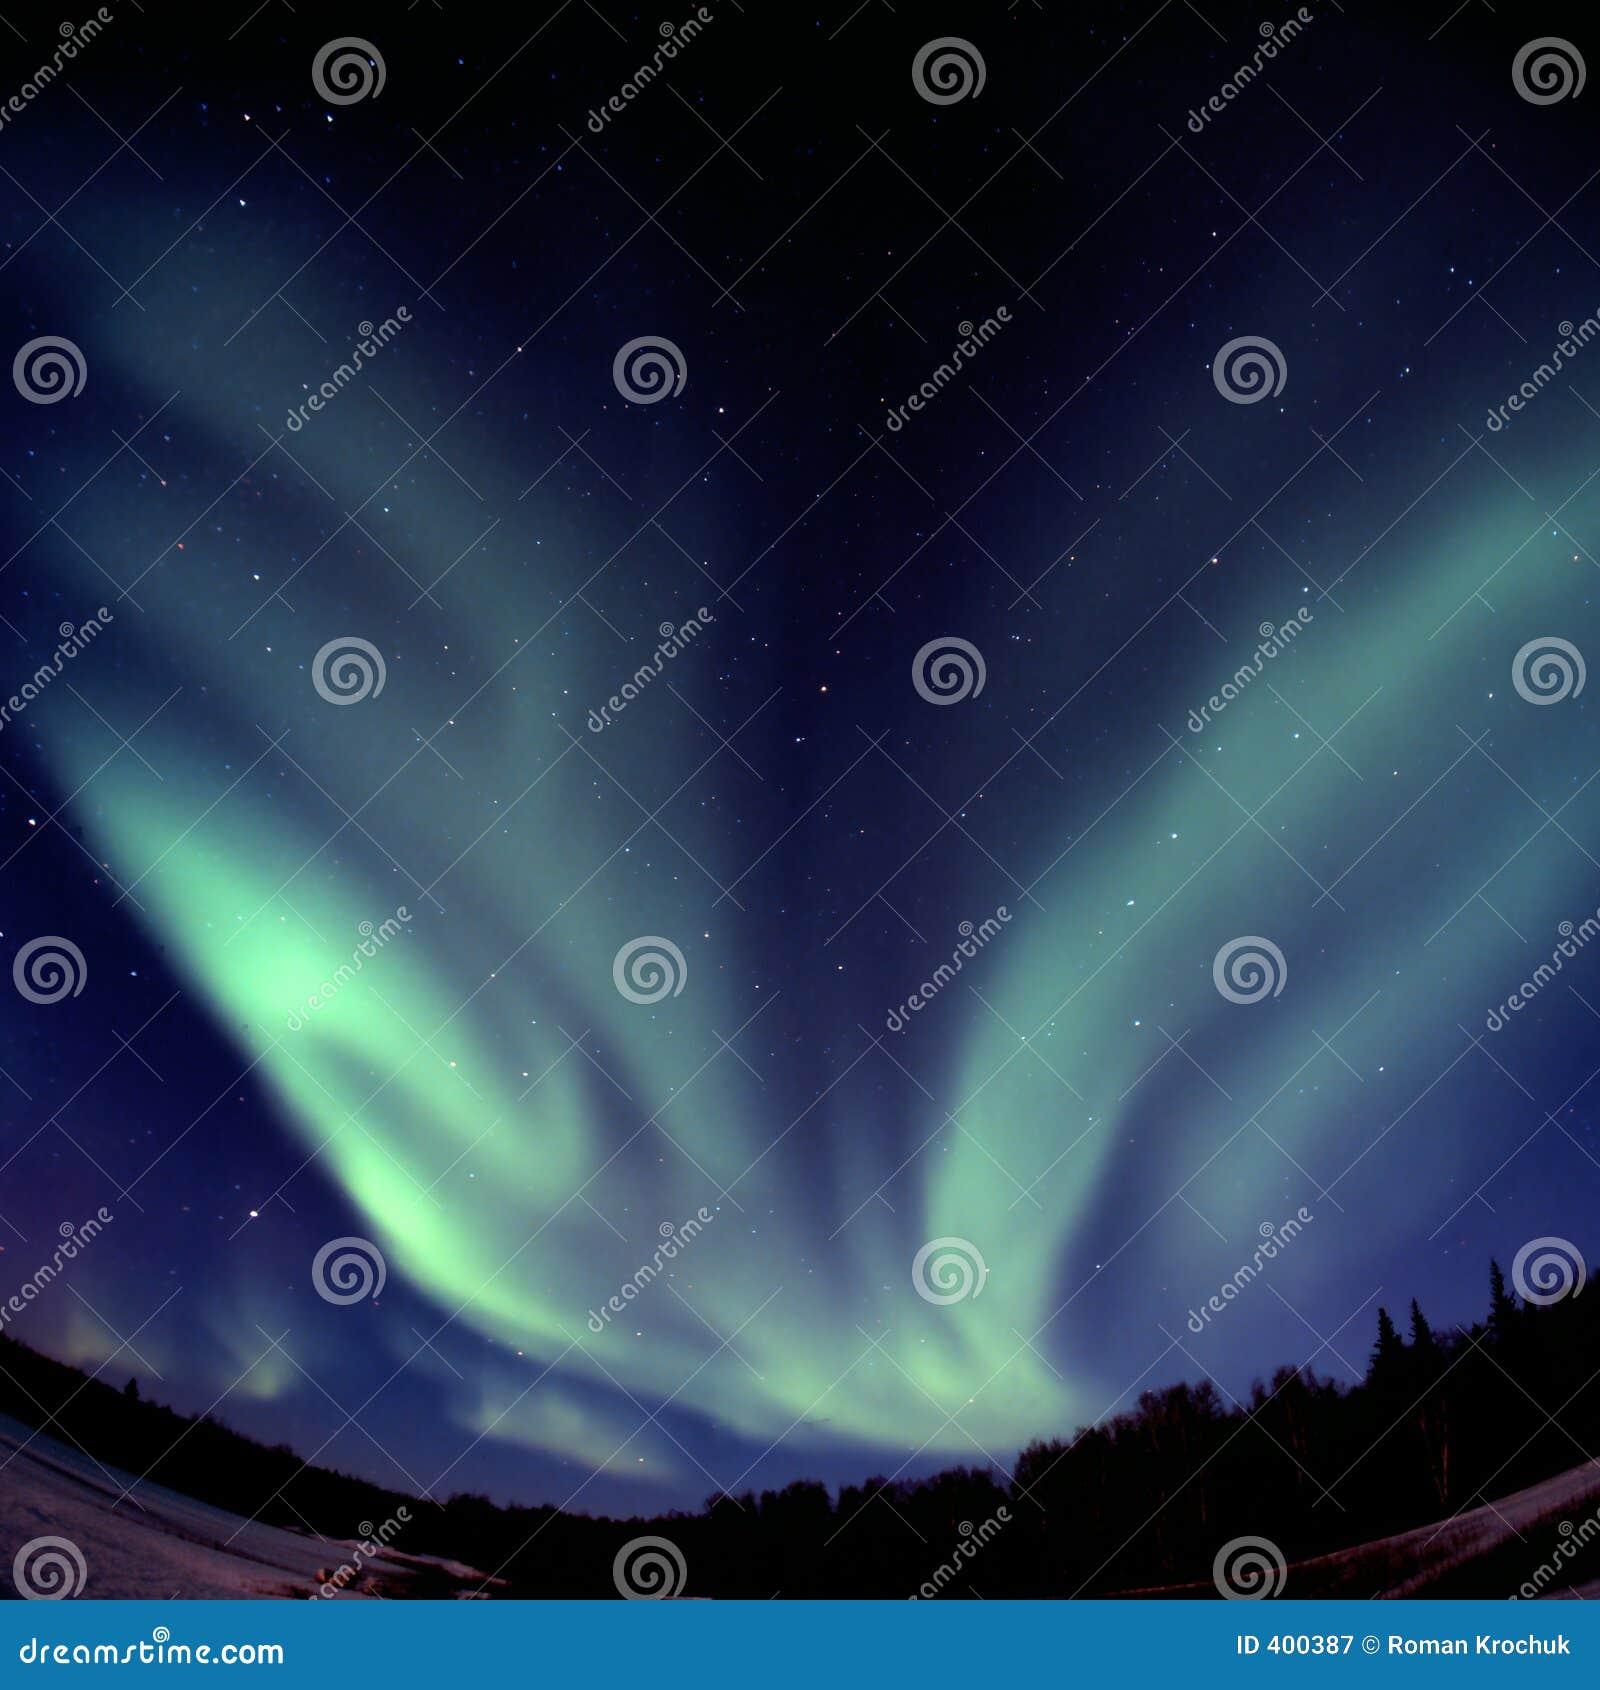 V-shaped aurora borelis arc